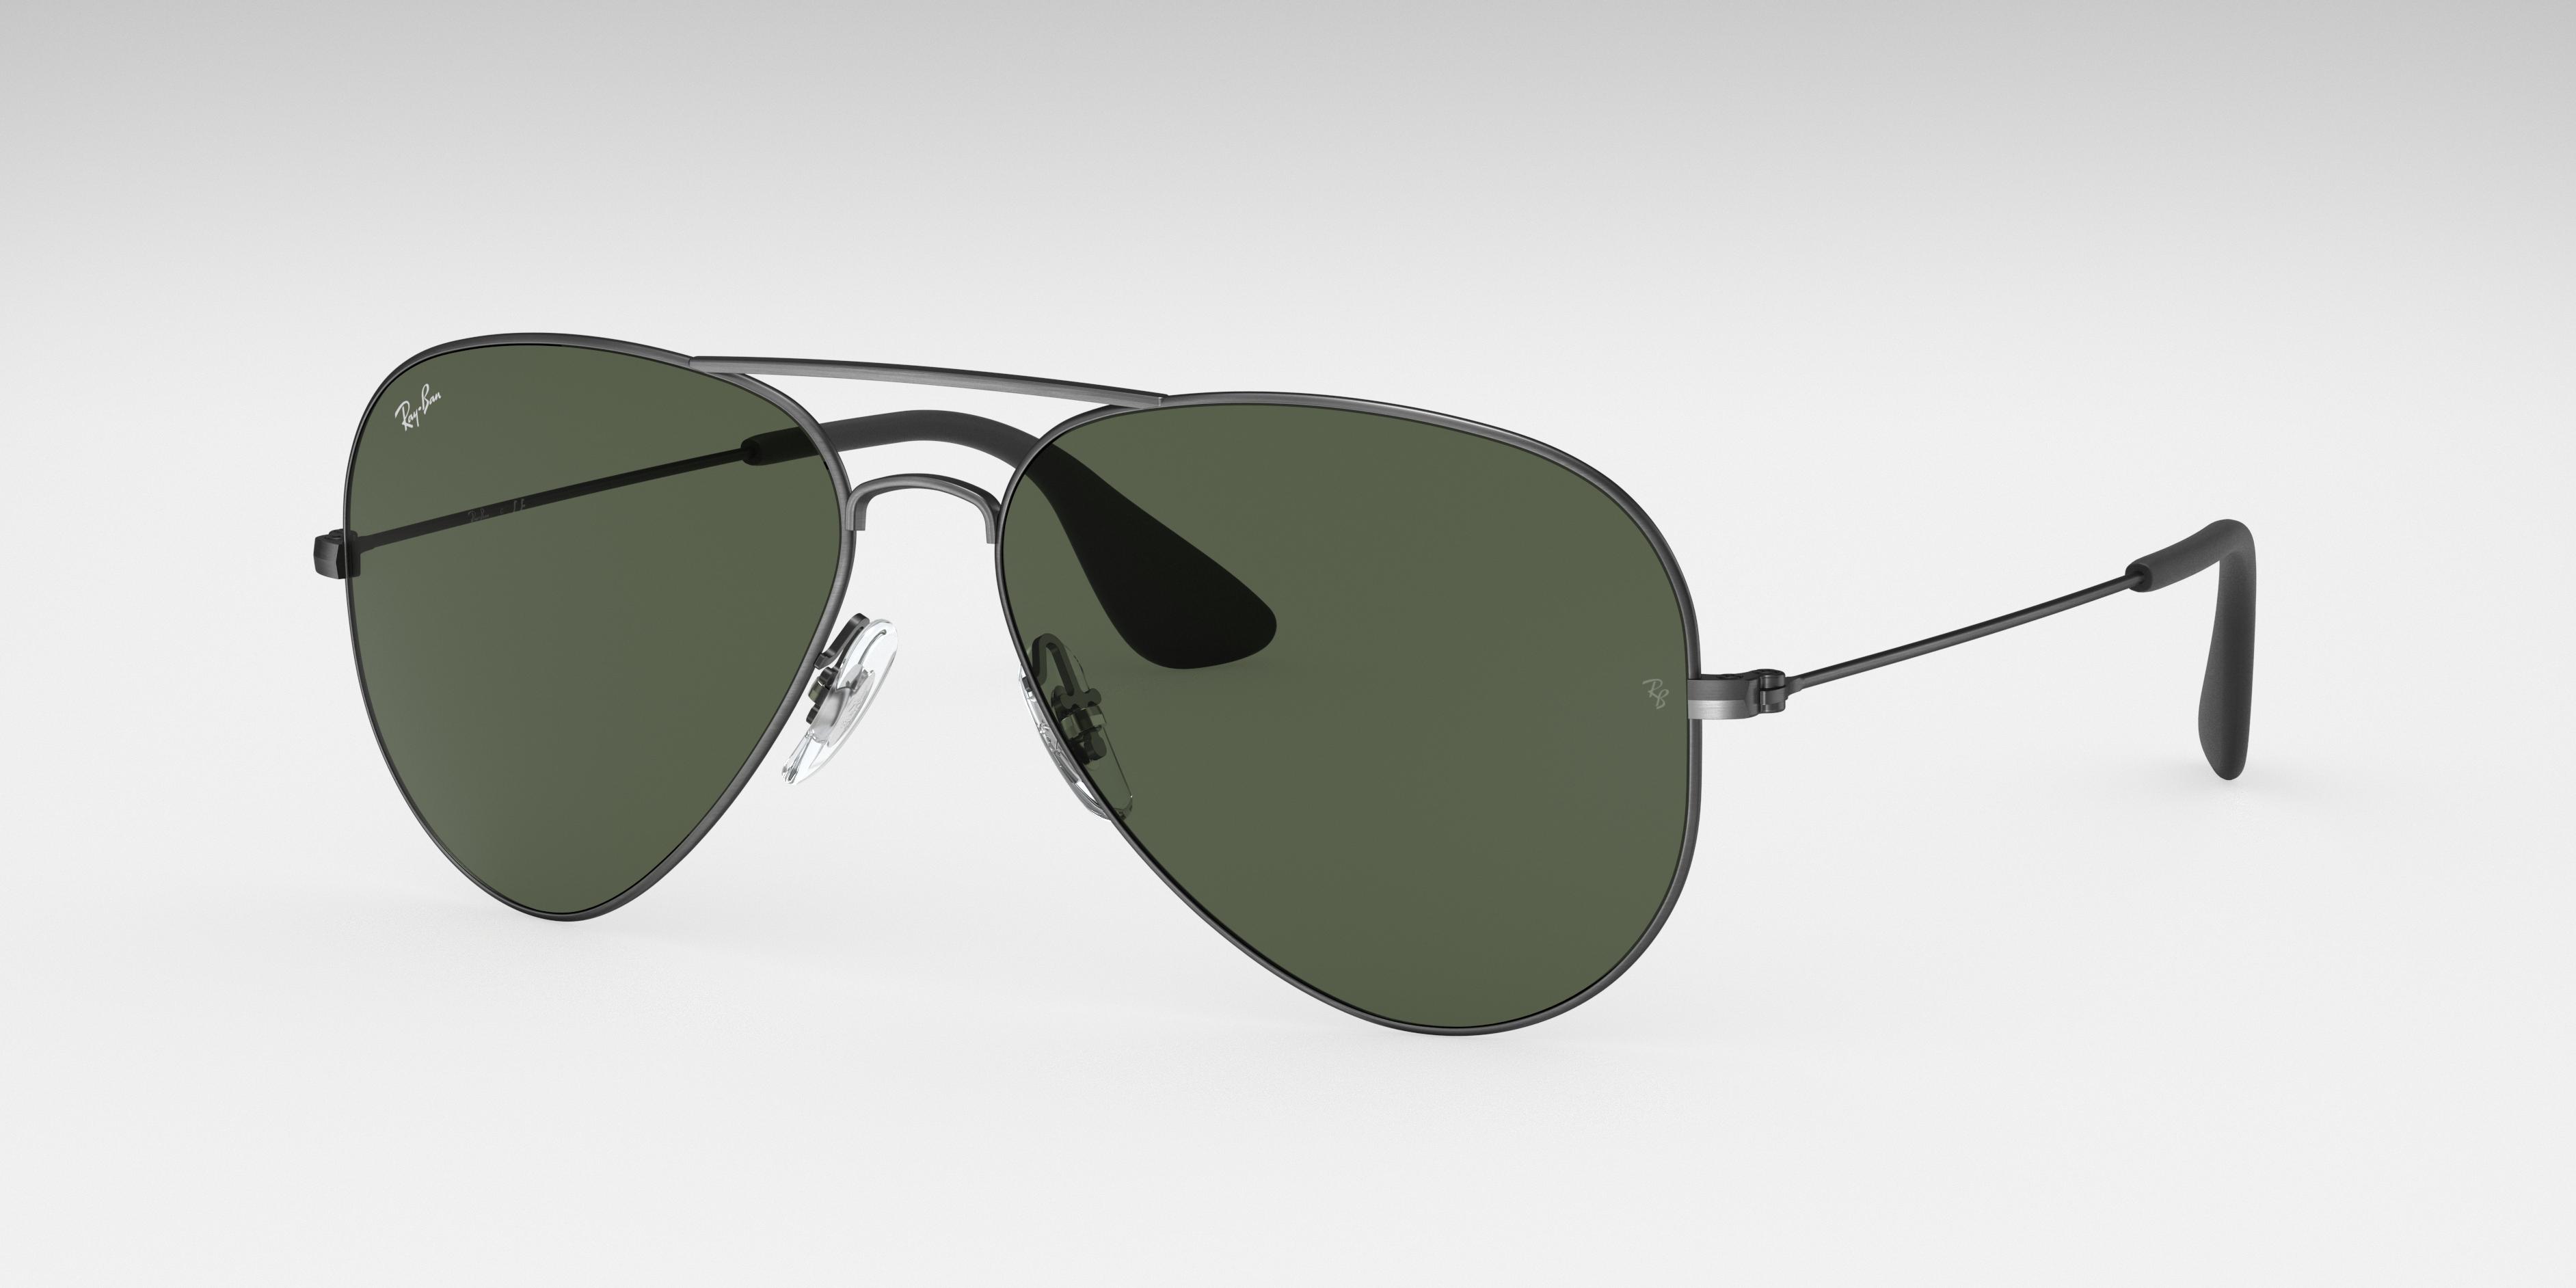 Ray-Ban Rb3558 Black, Green Lenses - RB3558